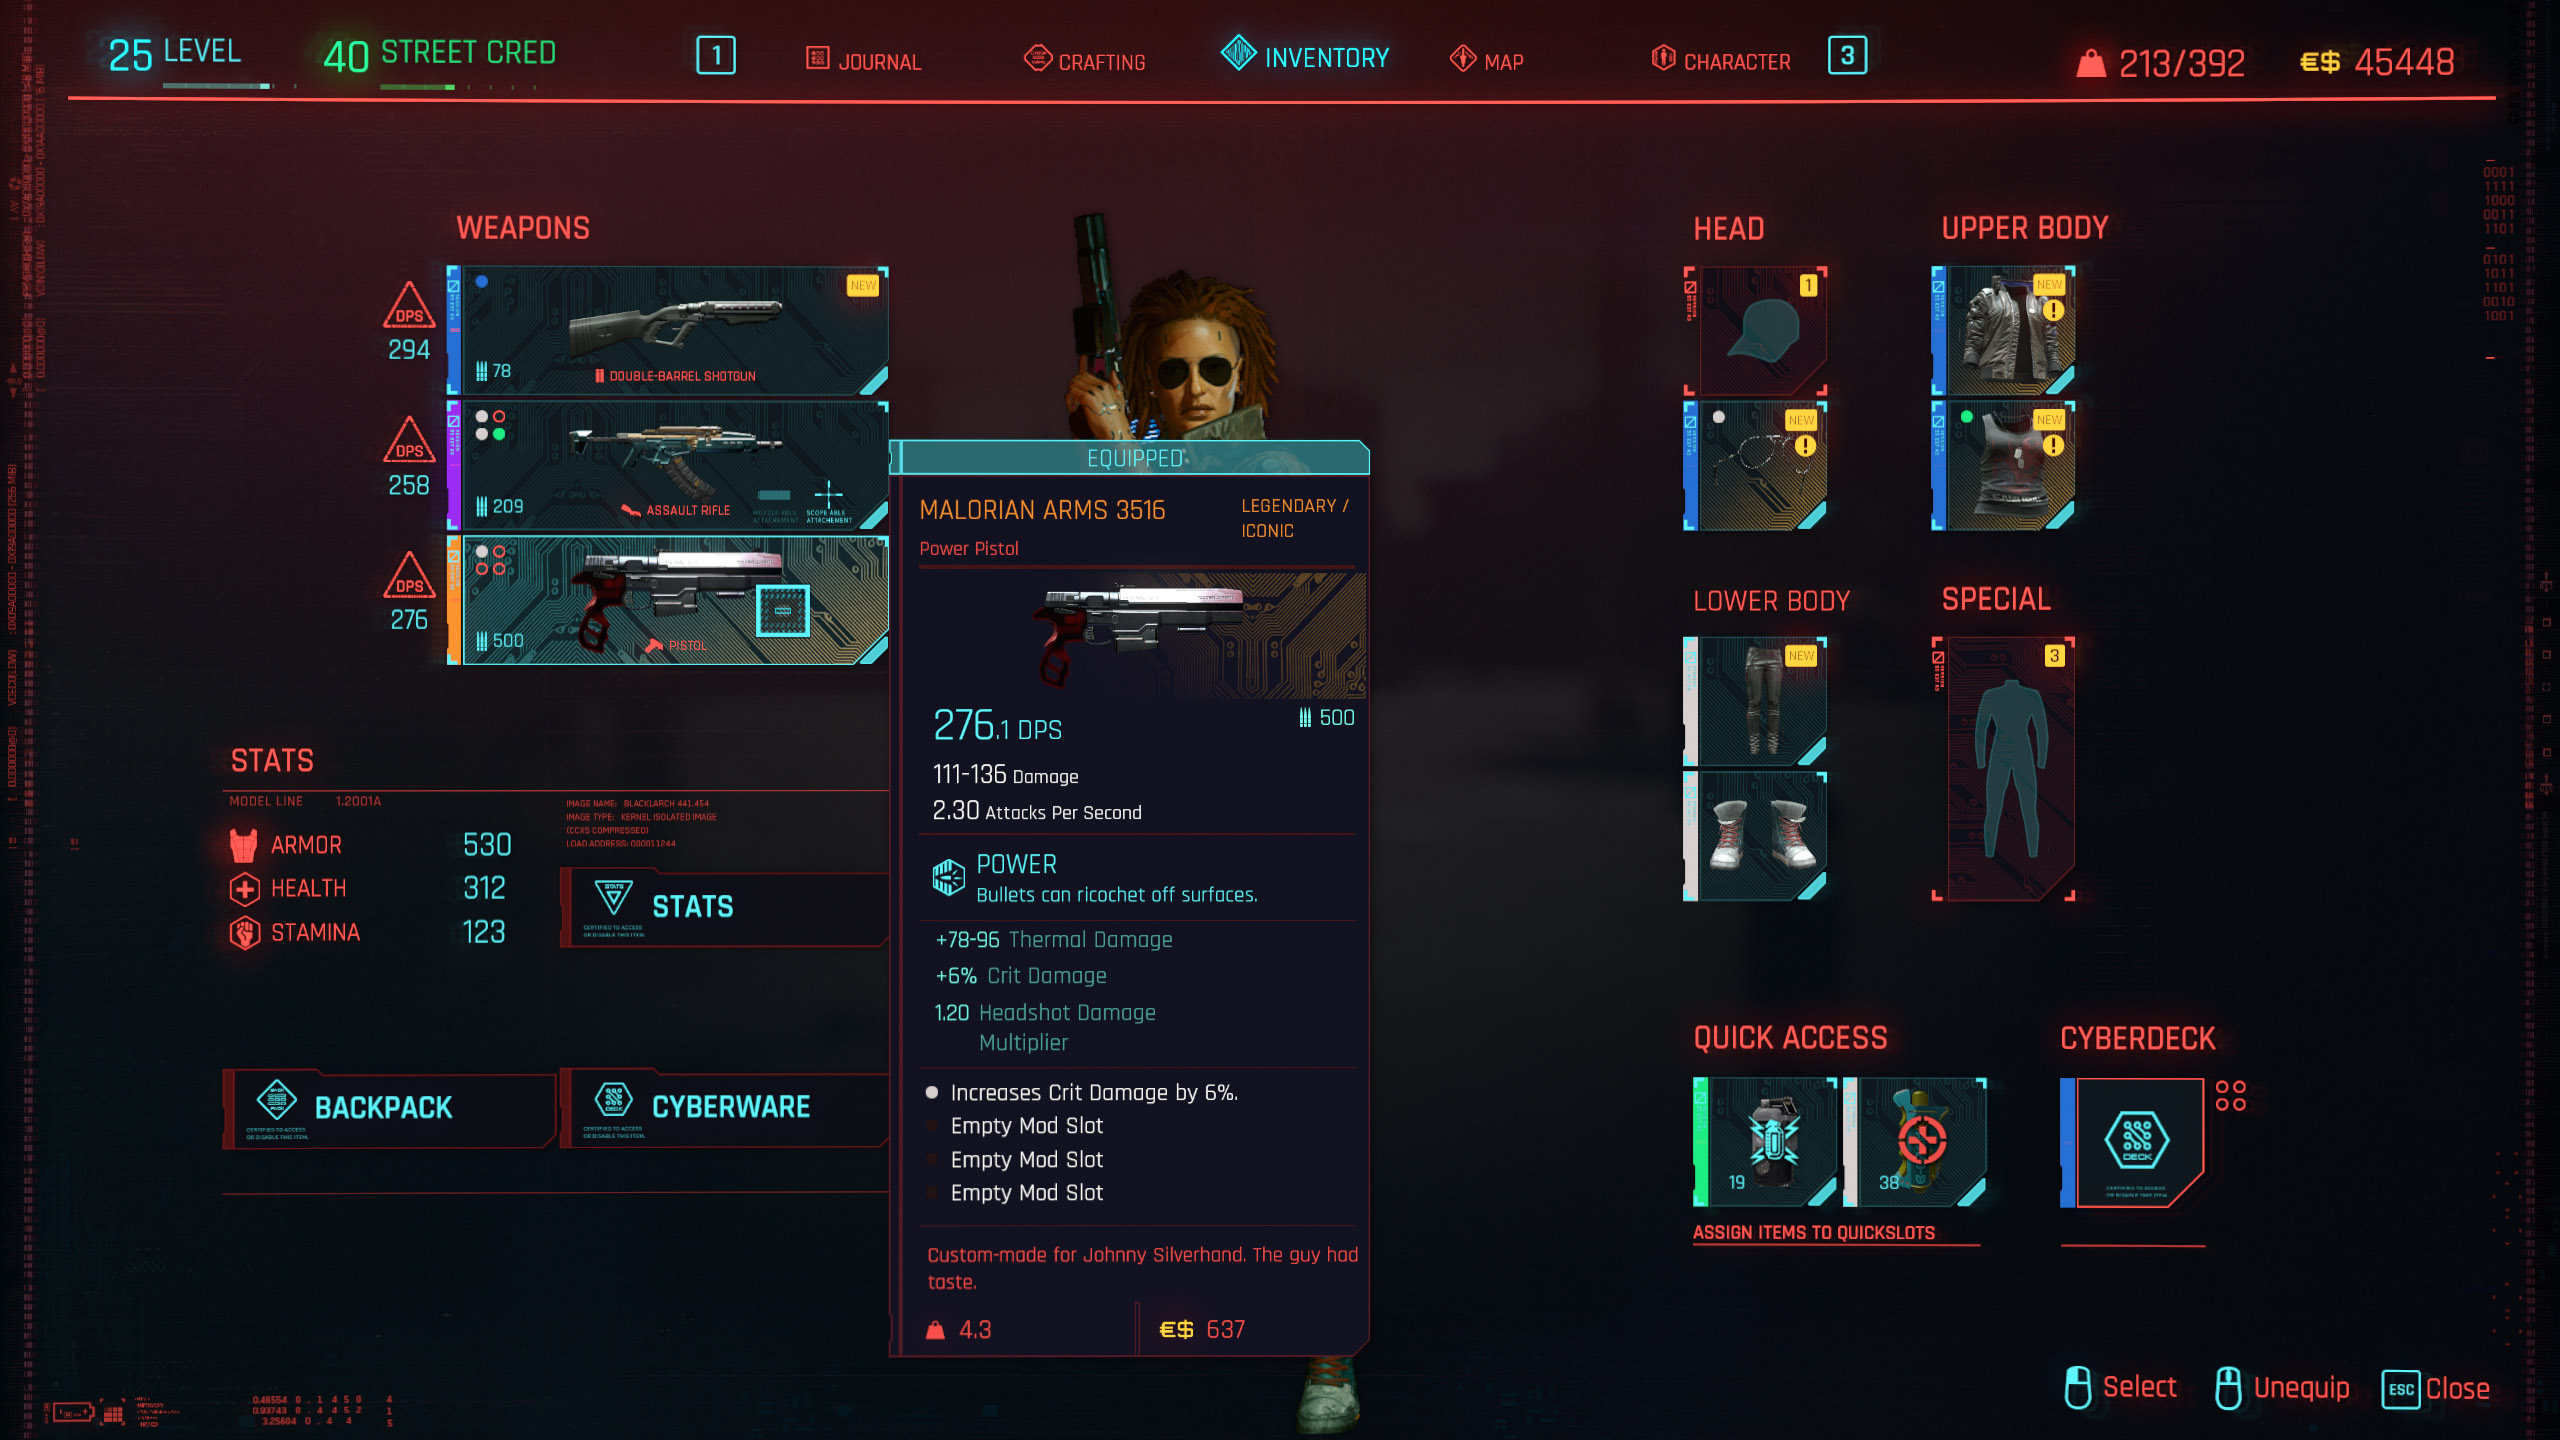 How to get Johnny Silverhand's gun - Cyberpunk 2077